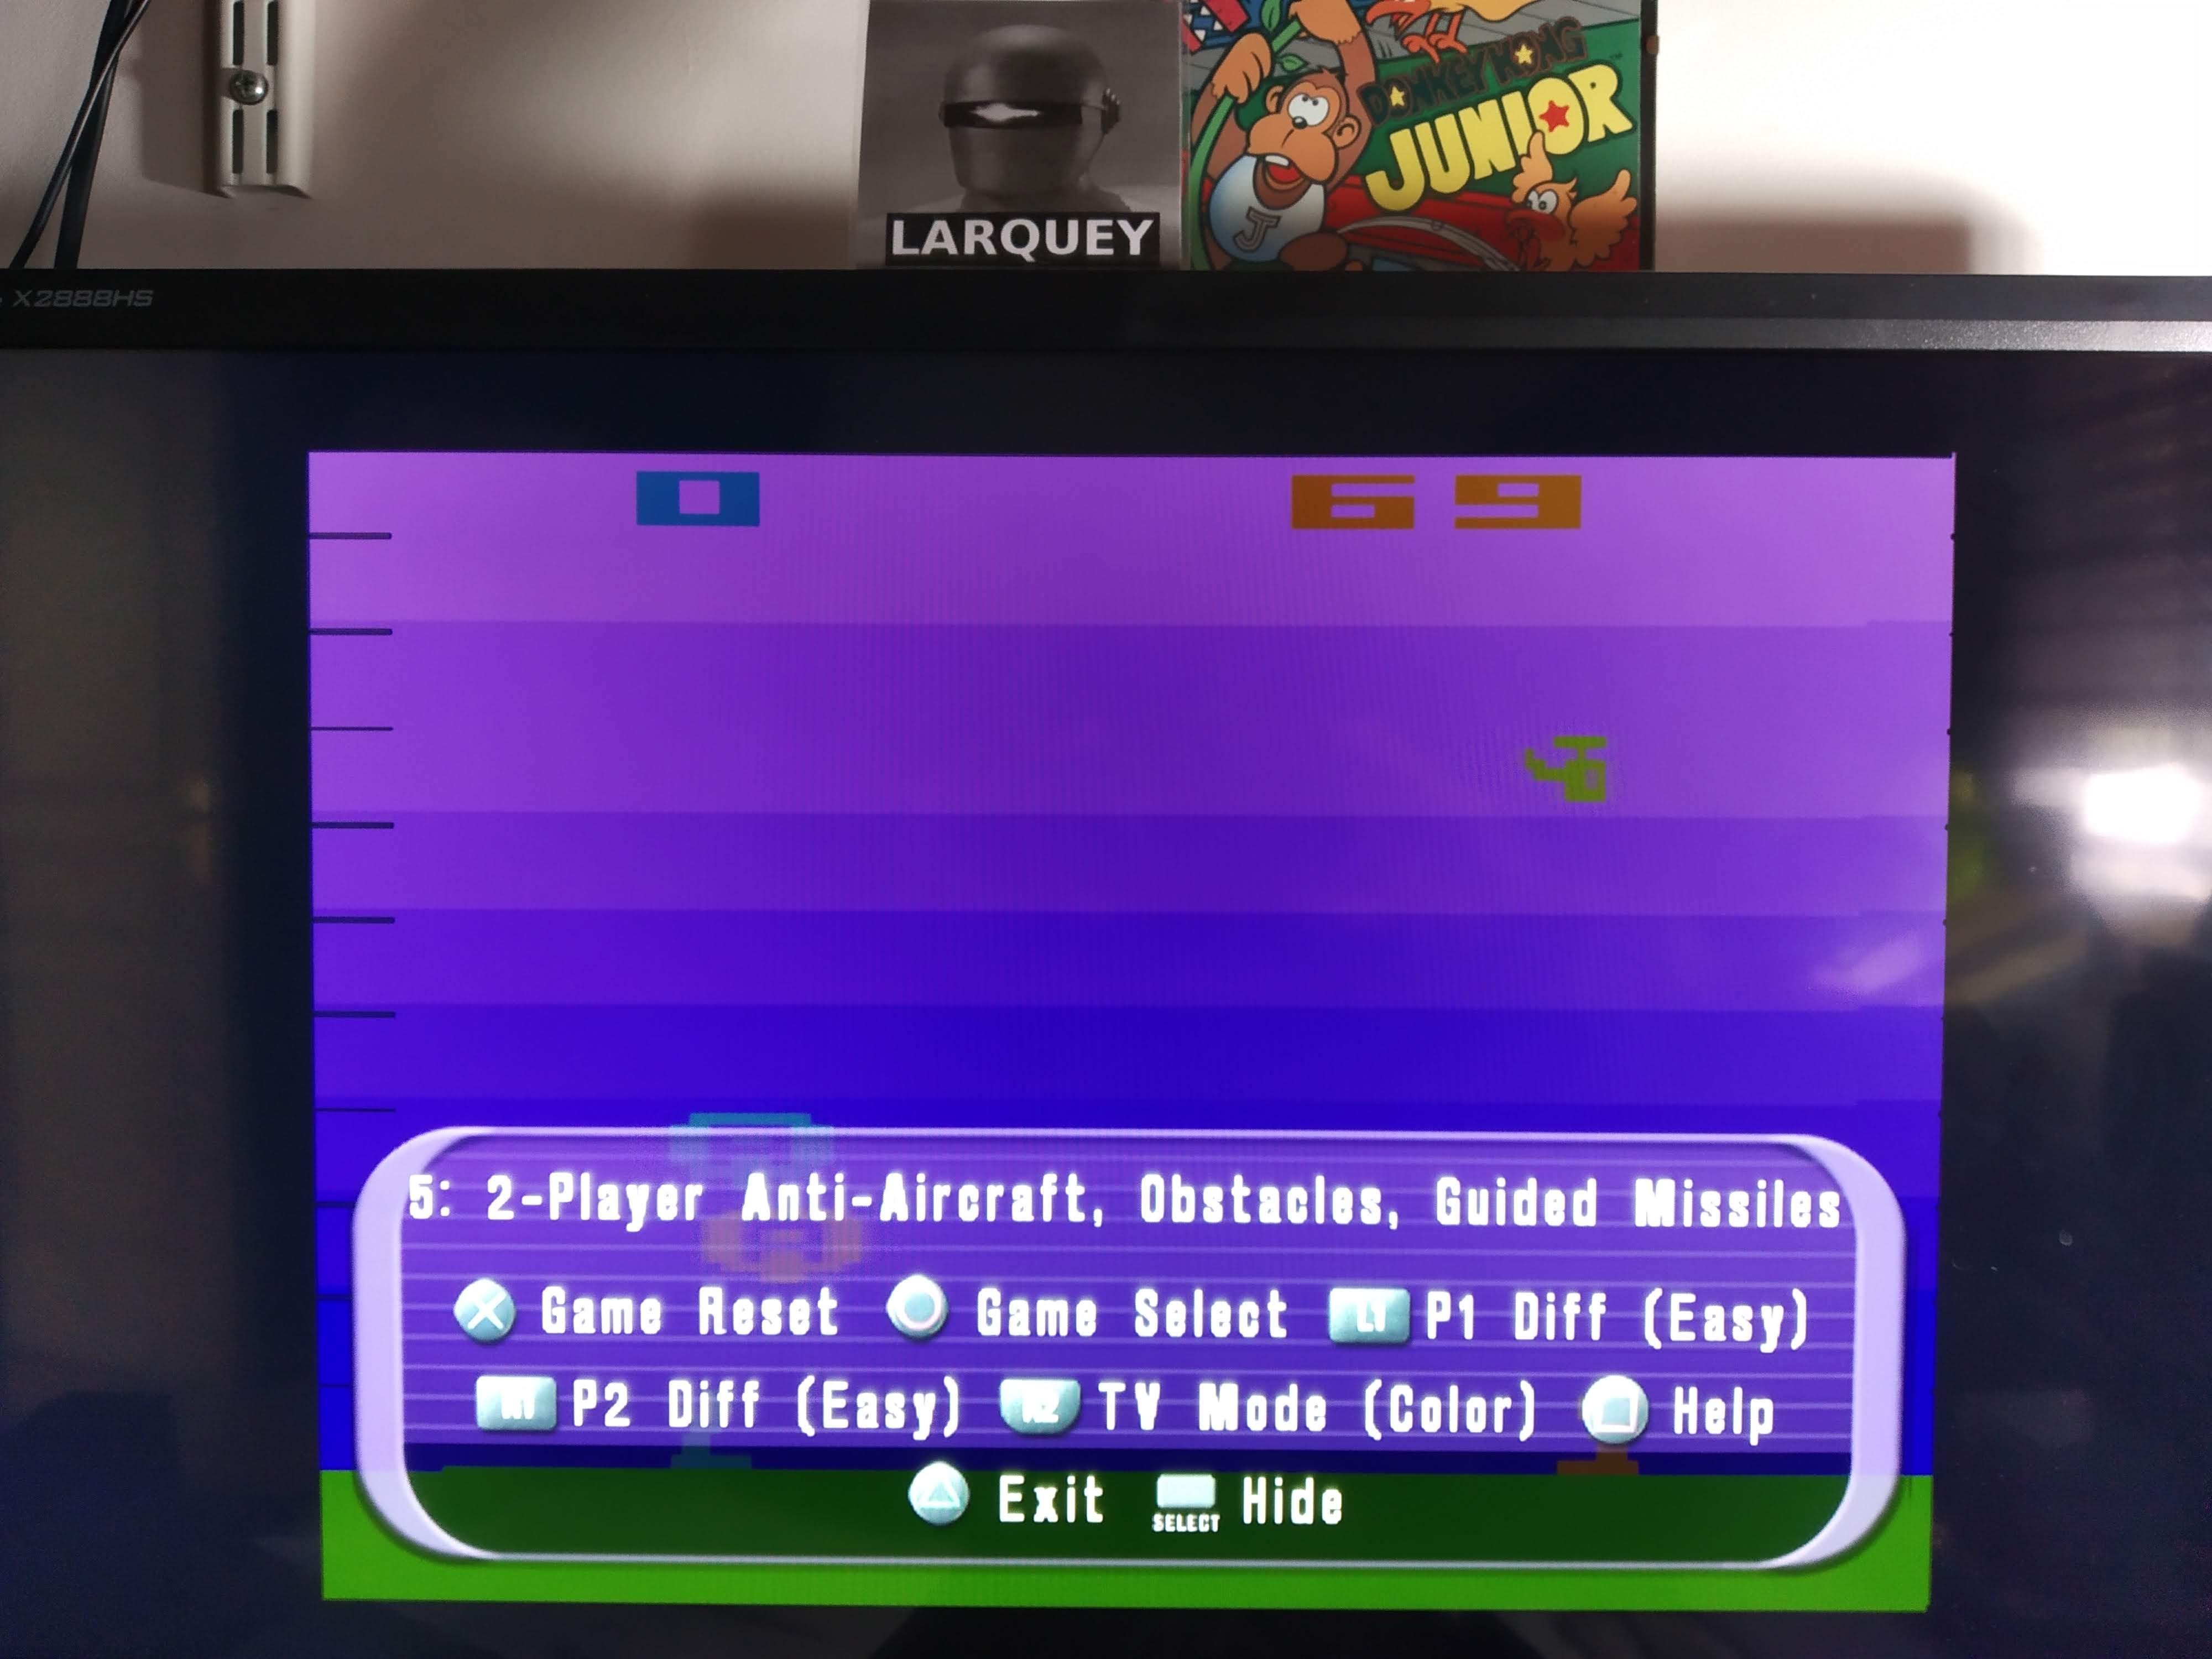 Larquey: Atari Anthology: Air-Sea Battle [Game 5B] (Playstation 2 Emulated) 69 points on 2020-08-05 12:17:46